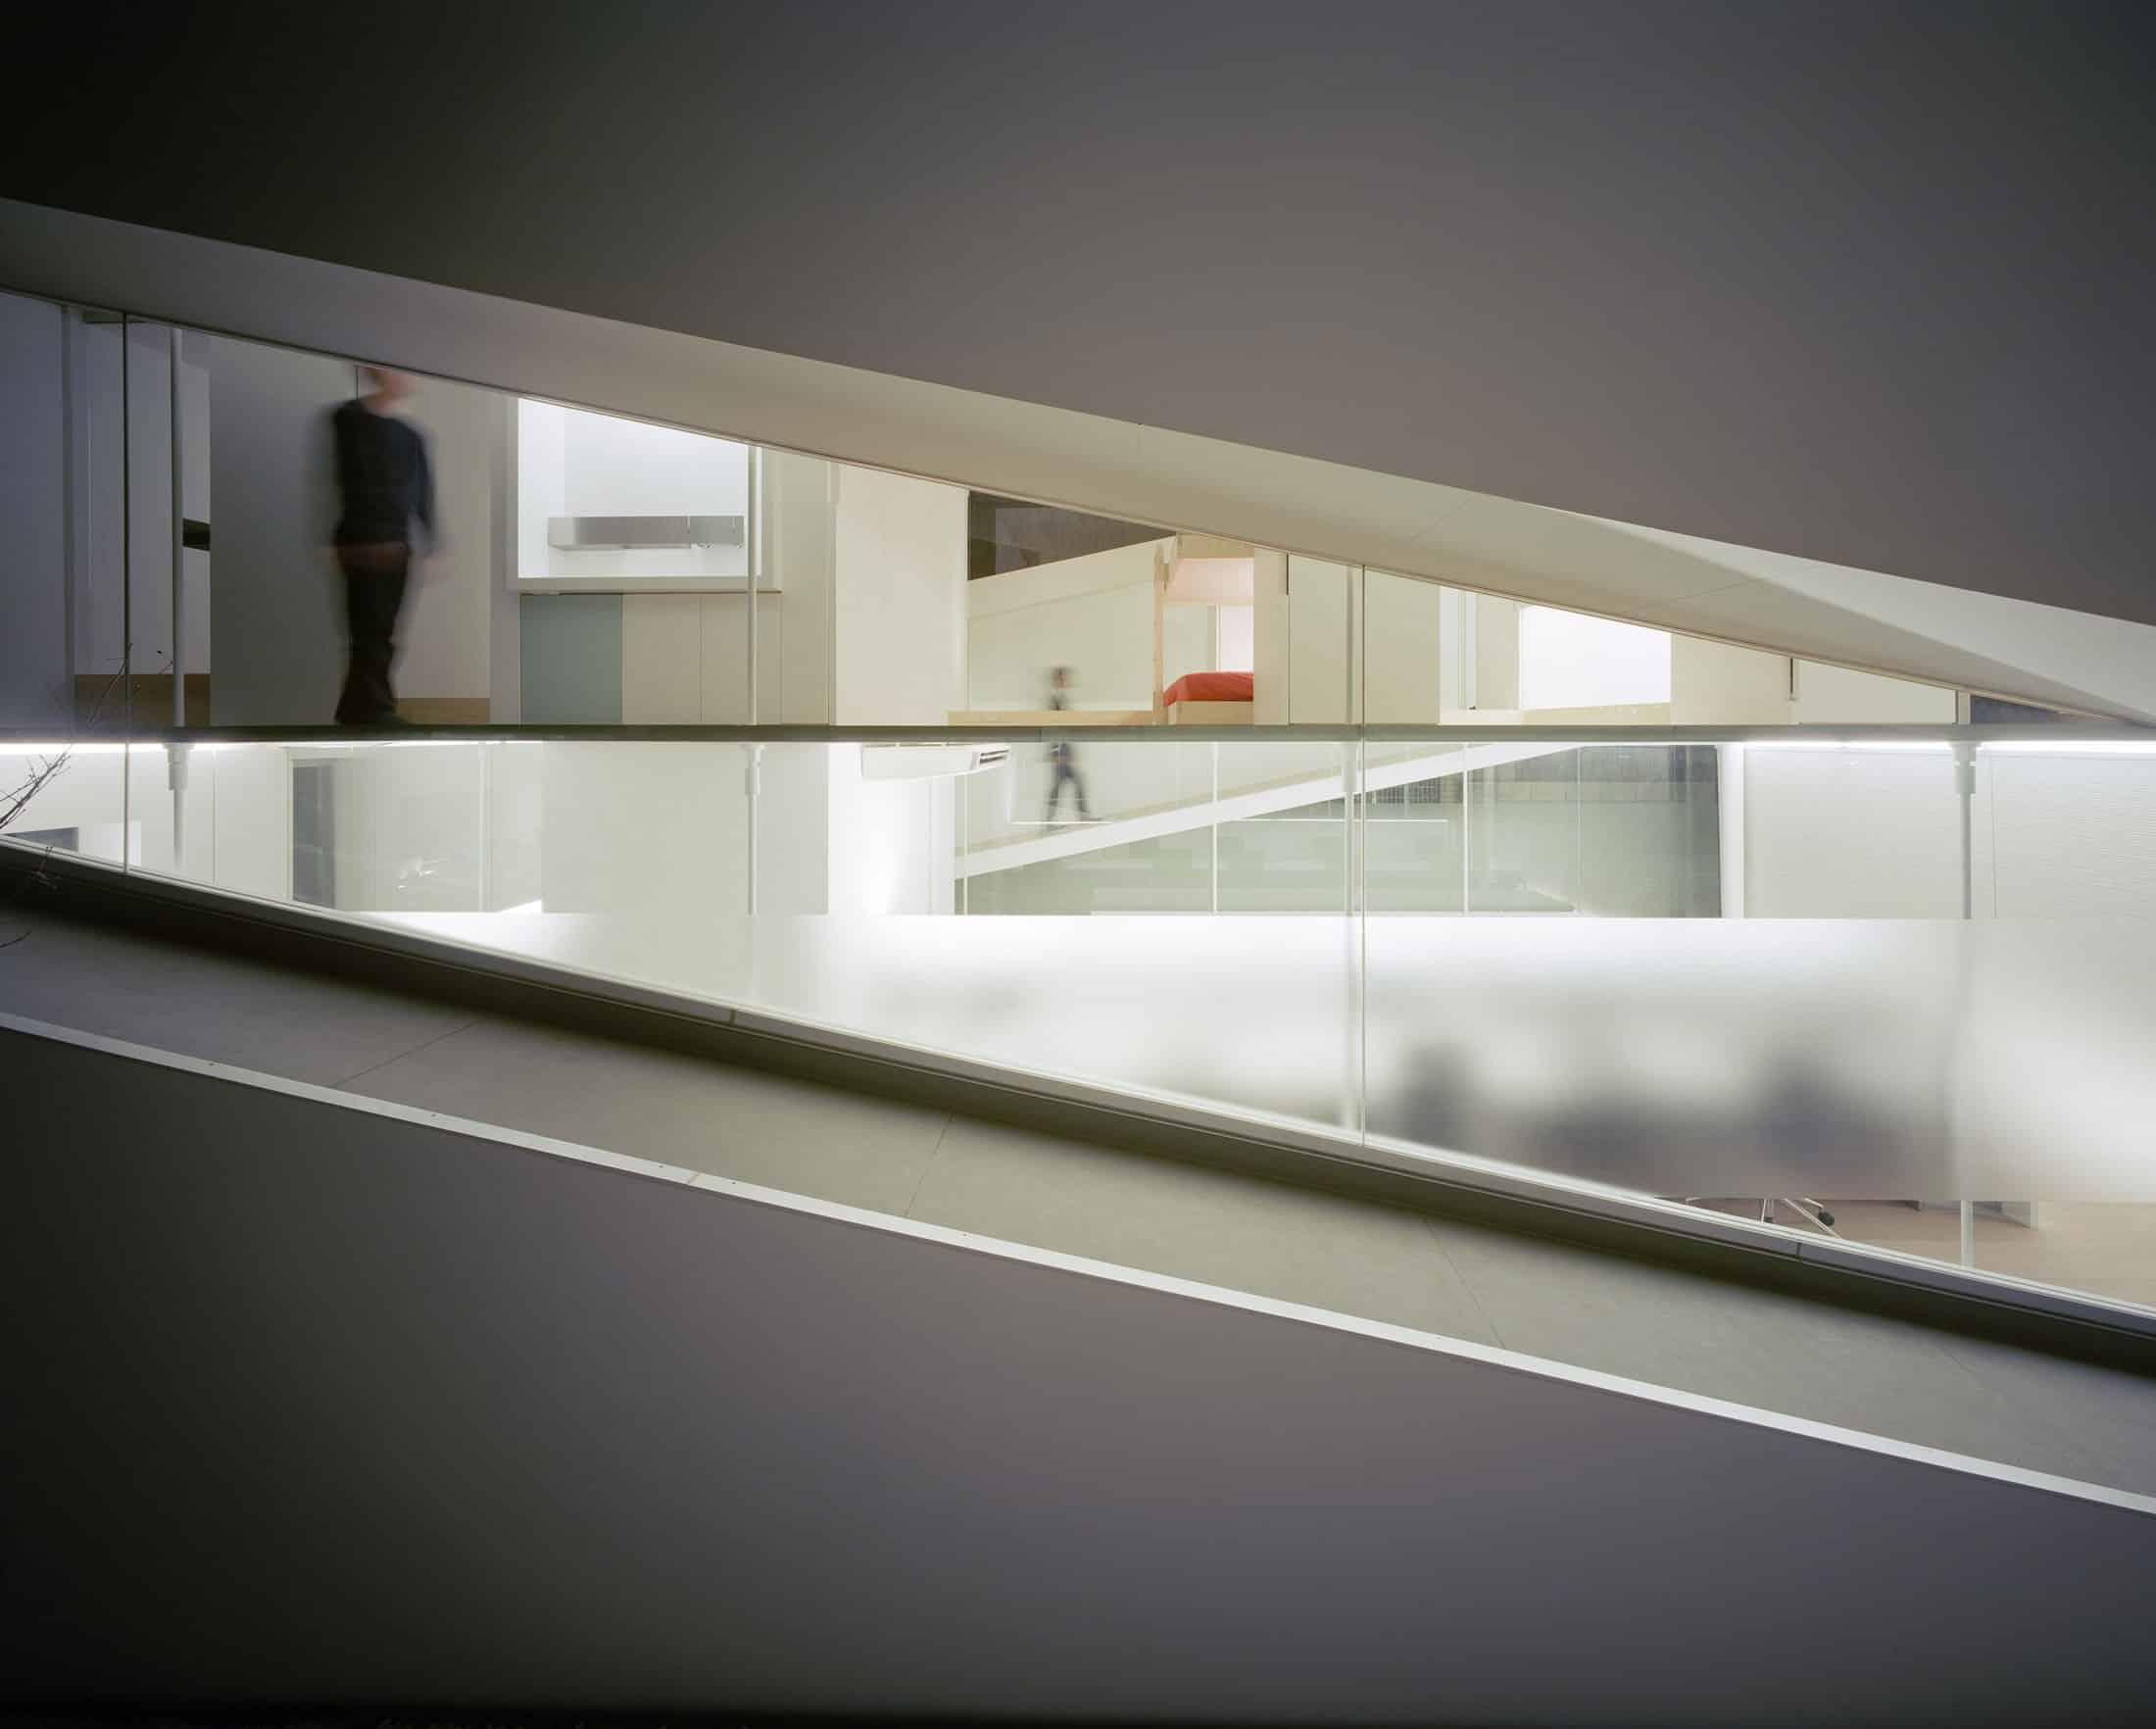 C1 House by Curiosity Architects (4)